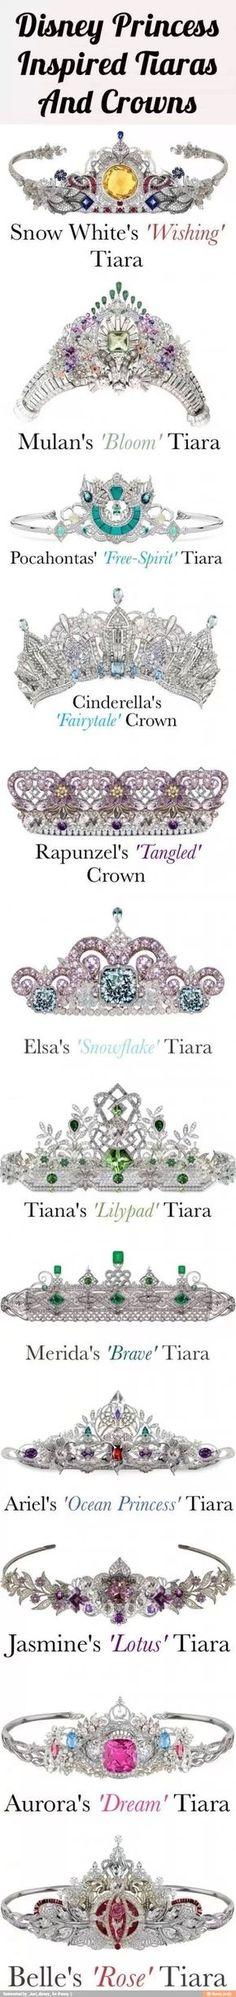 12 Disney Princess Tiaras And Crowns…All Set With Beautiful Diamonds, Gems Precious Stones. - I'll take the Cinderella, Rapunzel and of course Ariel tiara, please! Walt Disney, Disney Mode, Disney Fun, Disney Girls, Disney Style, Disney Magic, Disney Nerd, Disney And Dreamworks, Disney Pixar